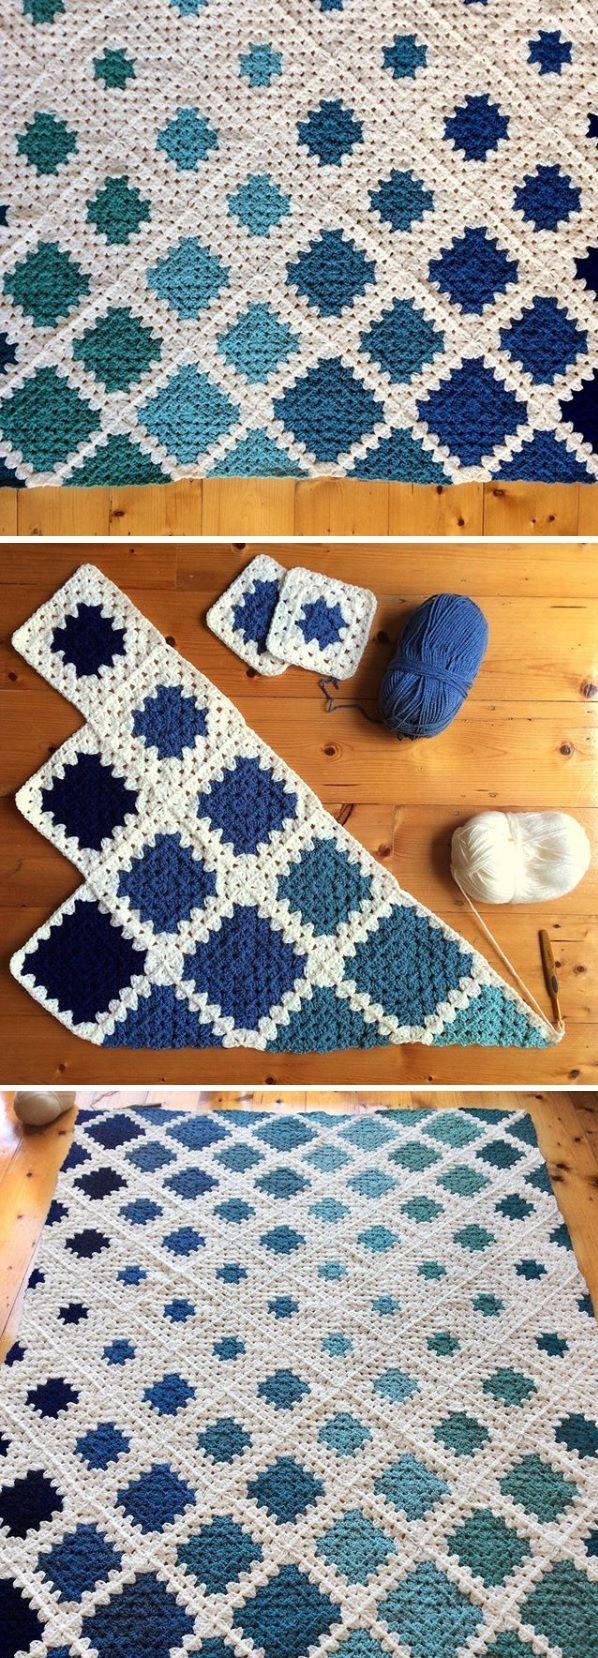 Square Motif Blanket Tutorial